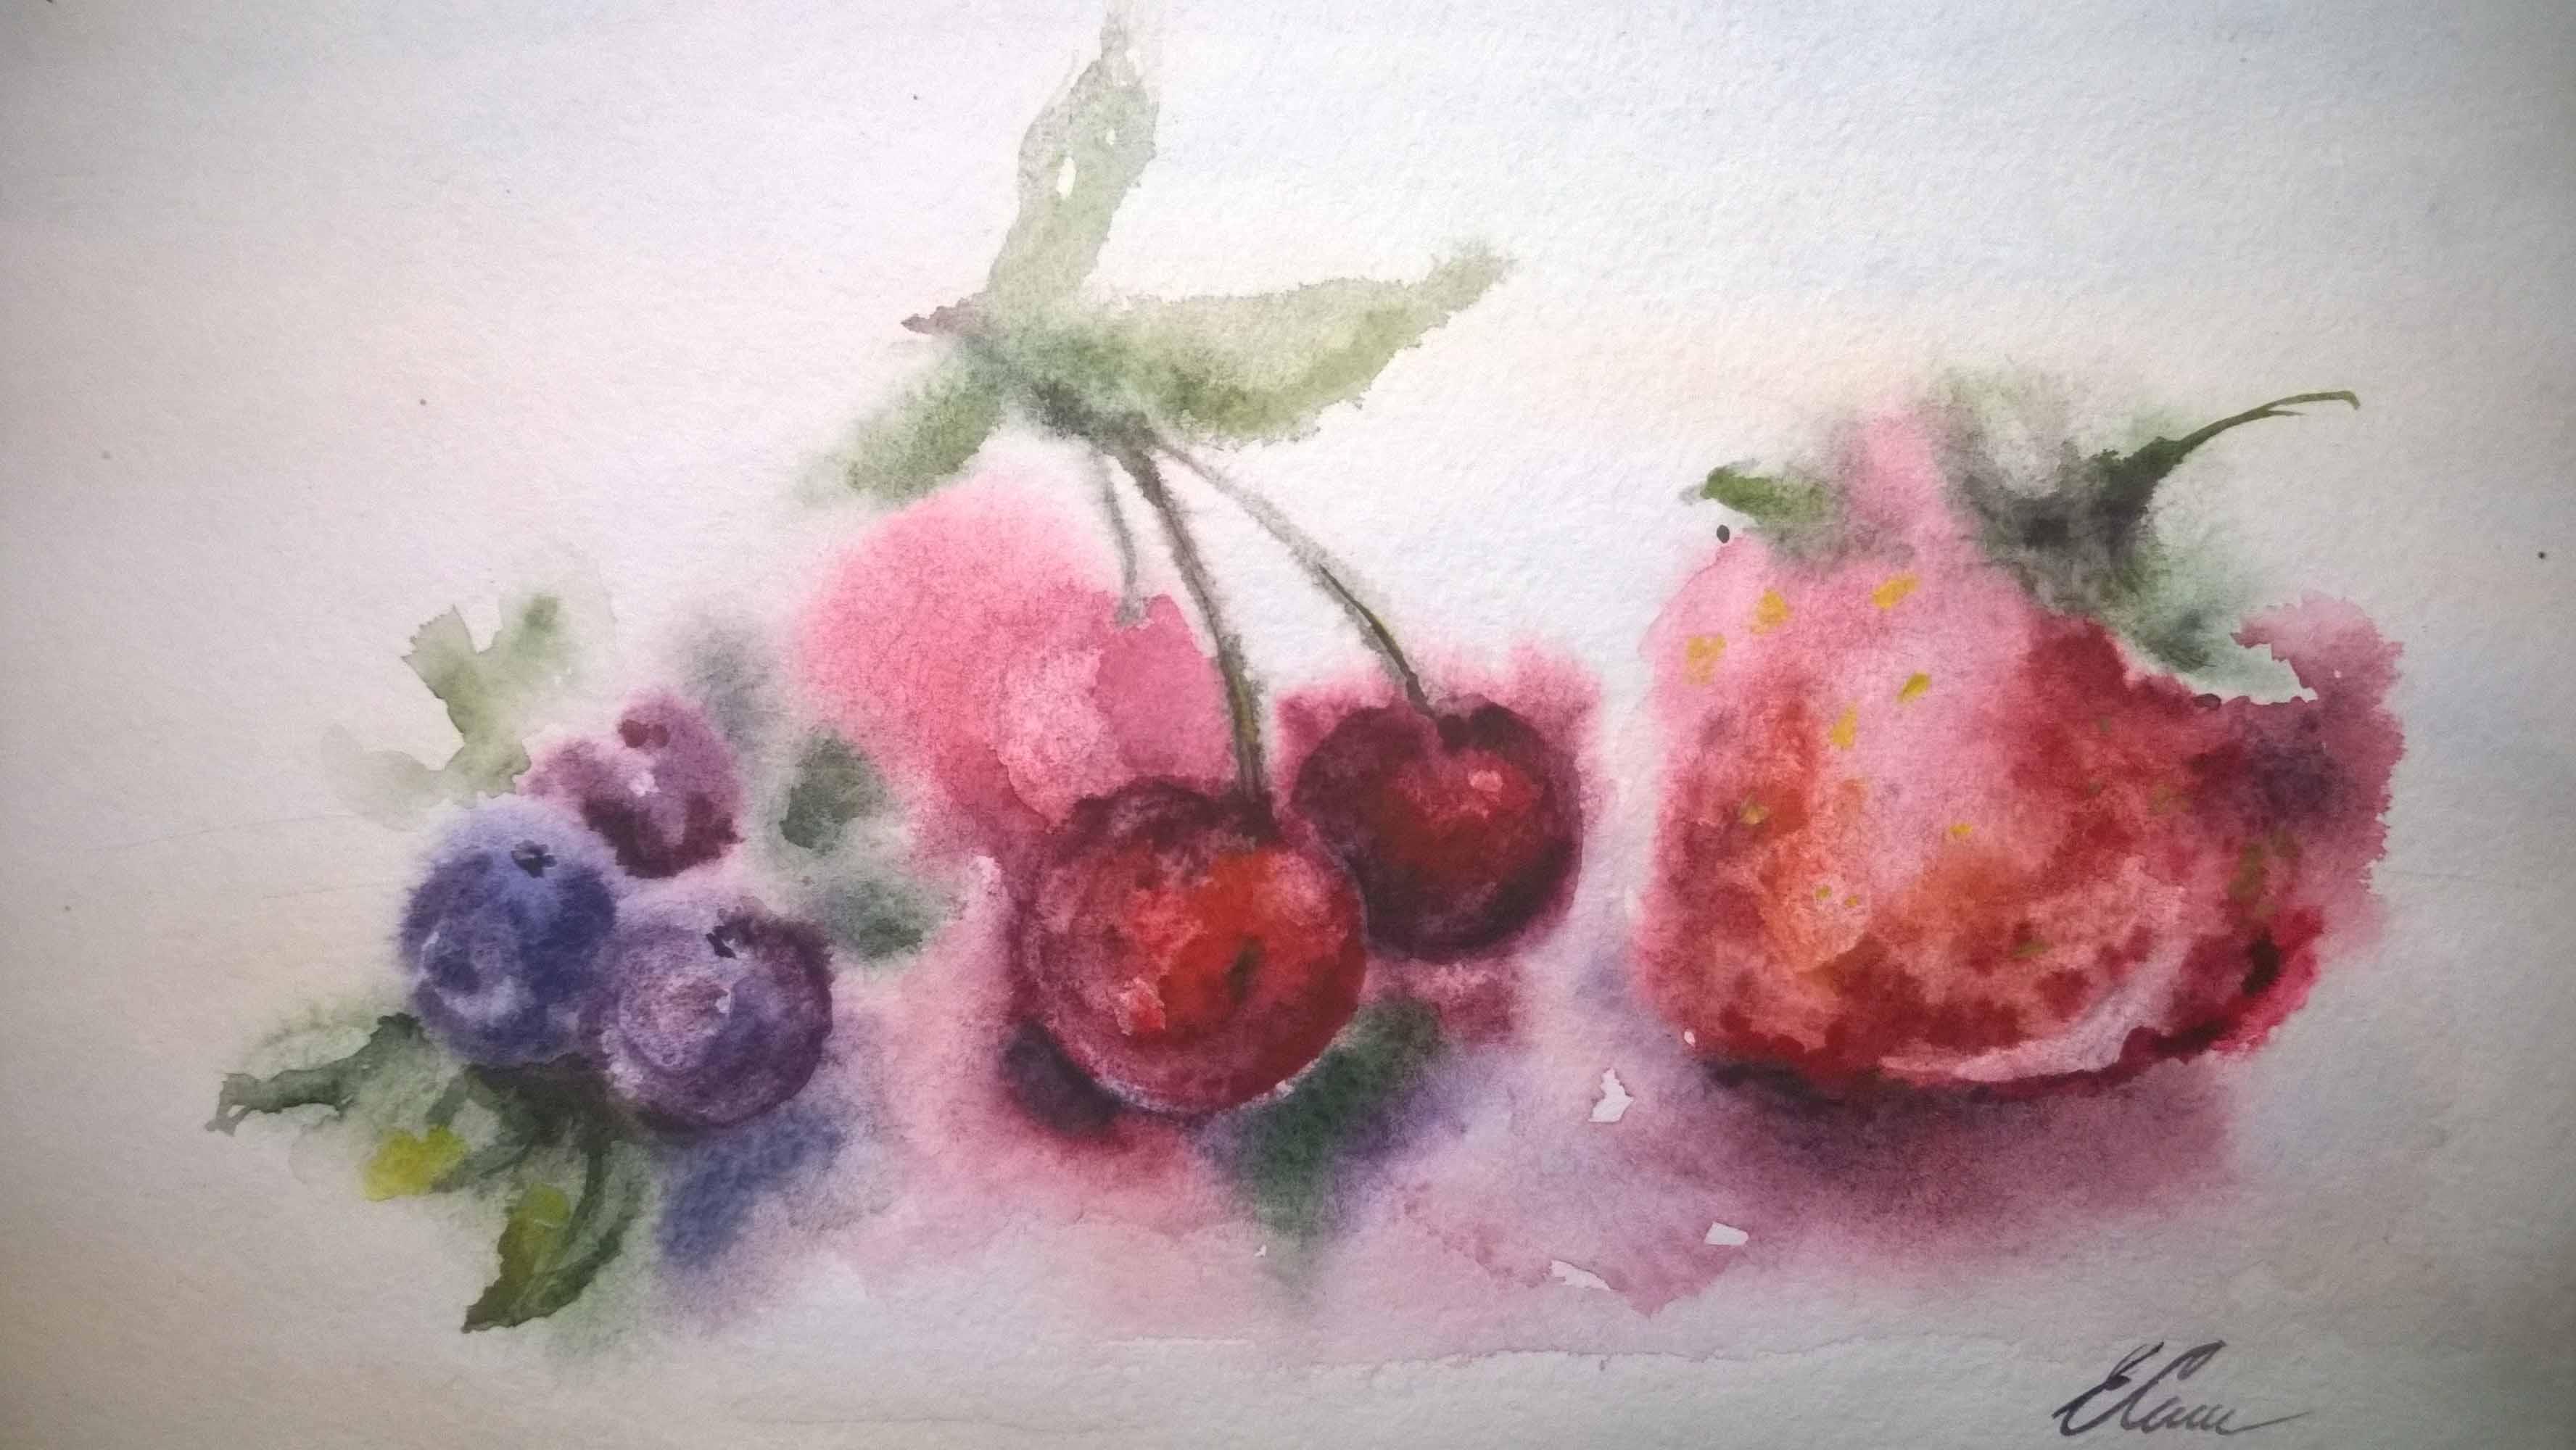 Kattys - Les fruits